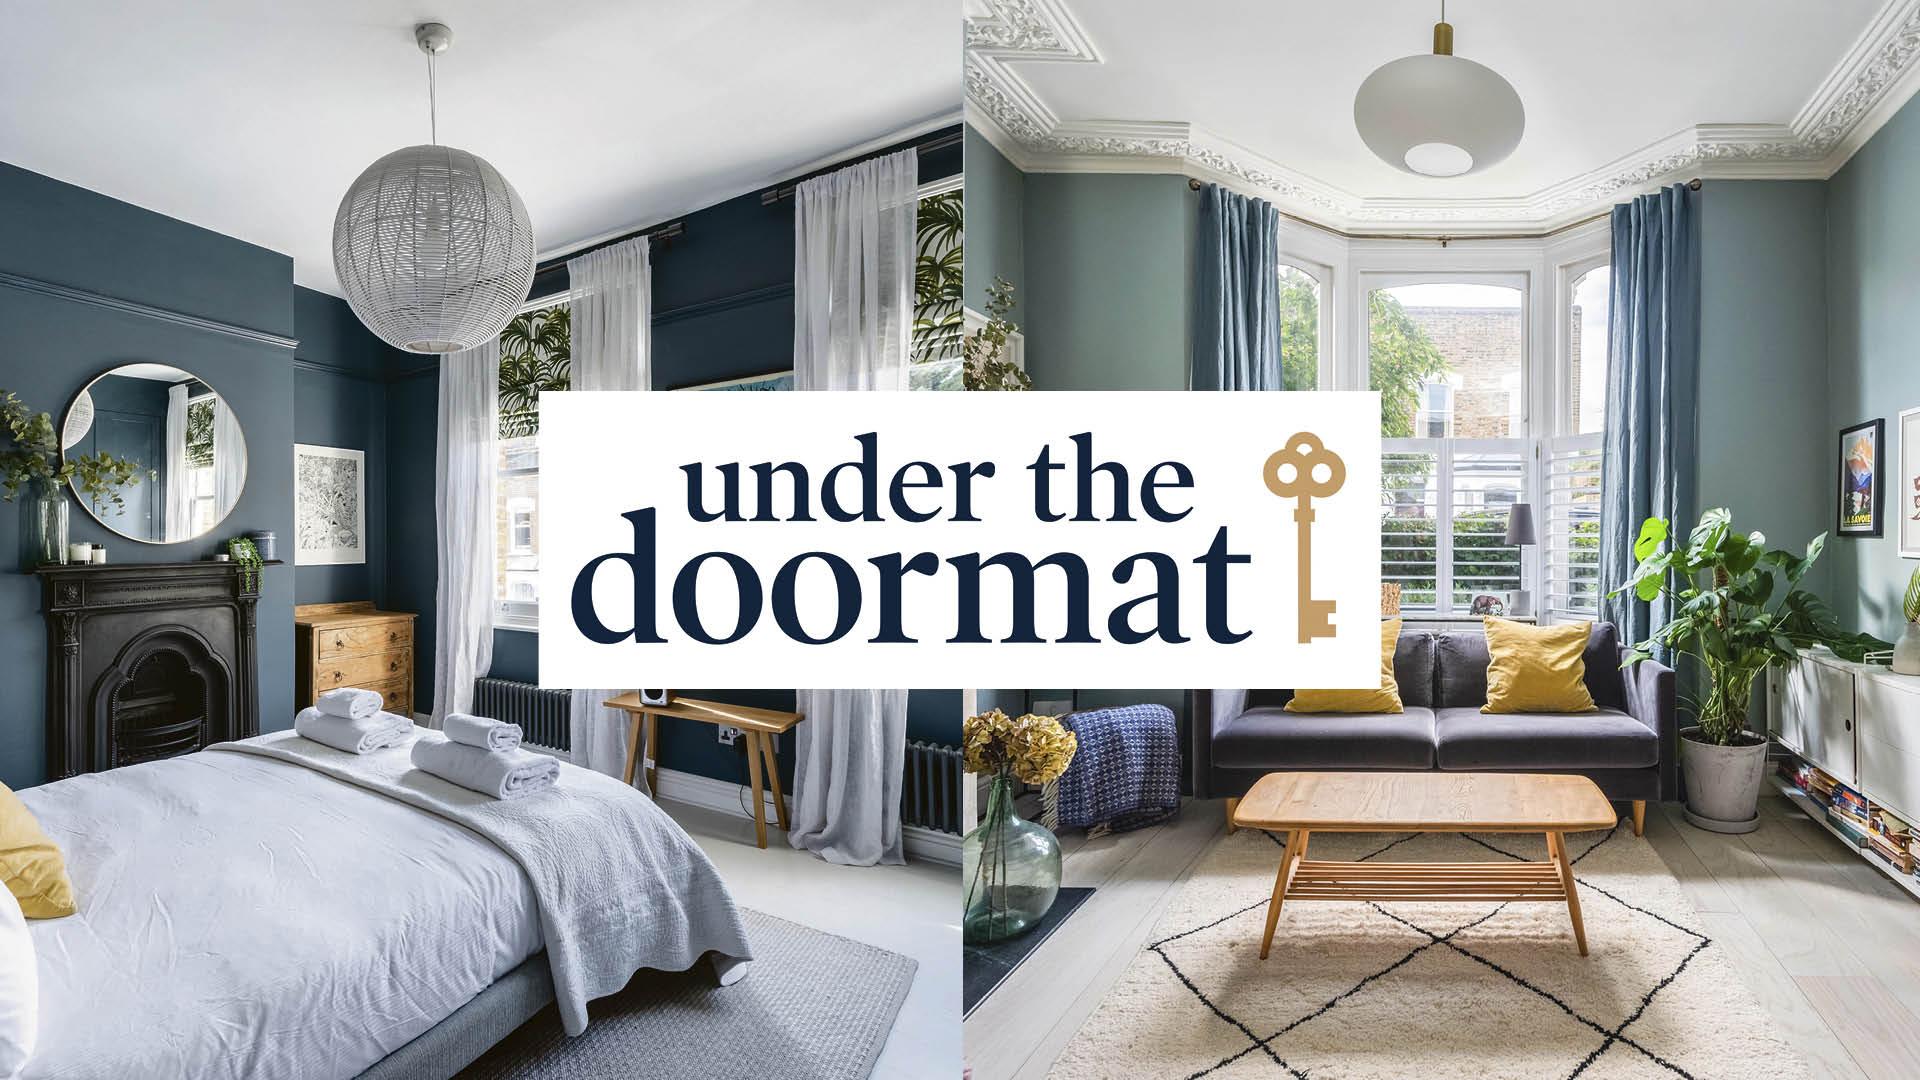 Win a luxury two-night homestay in London Worth £400!